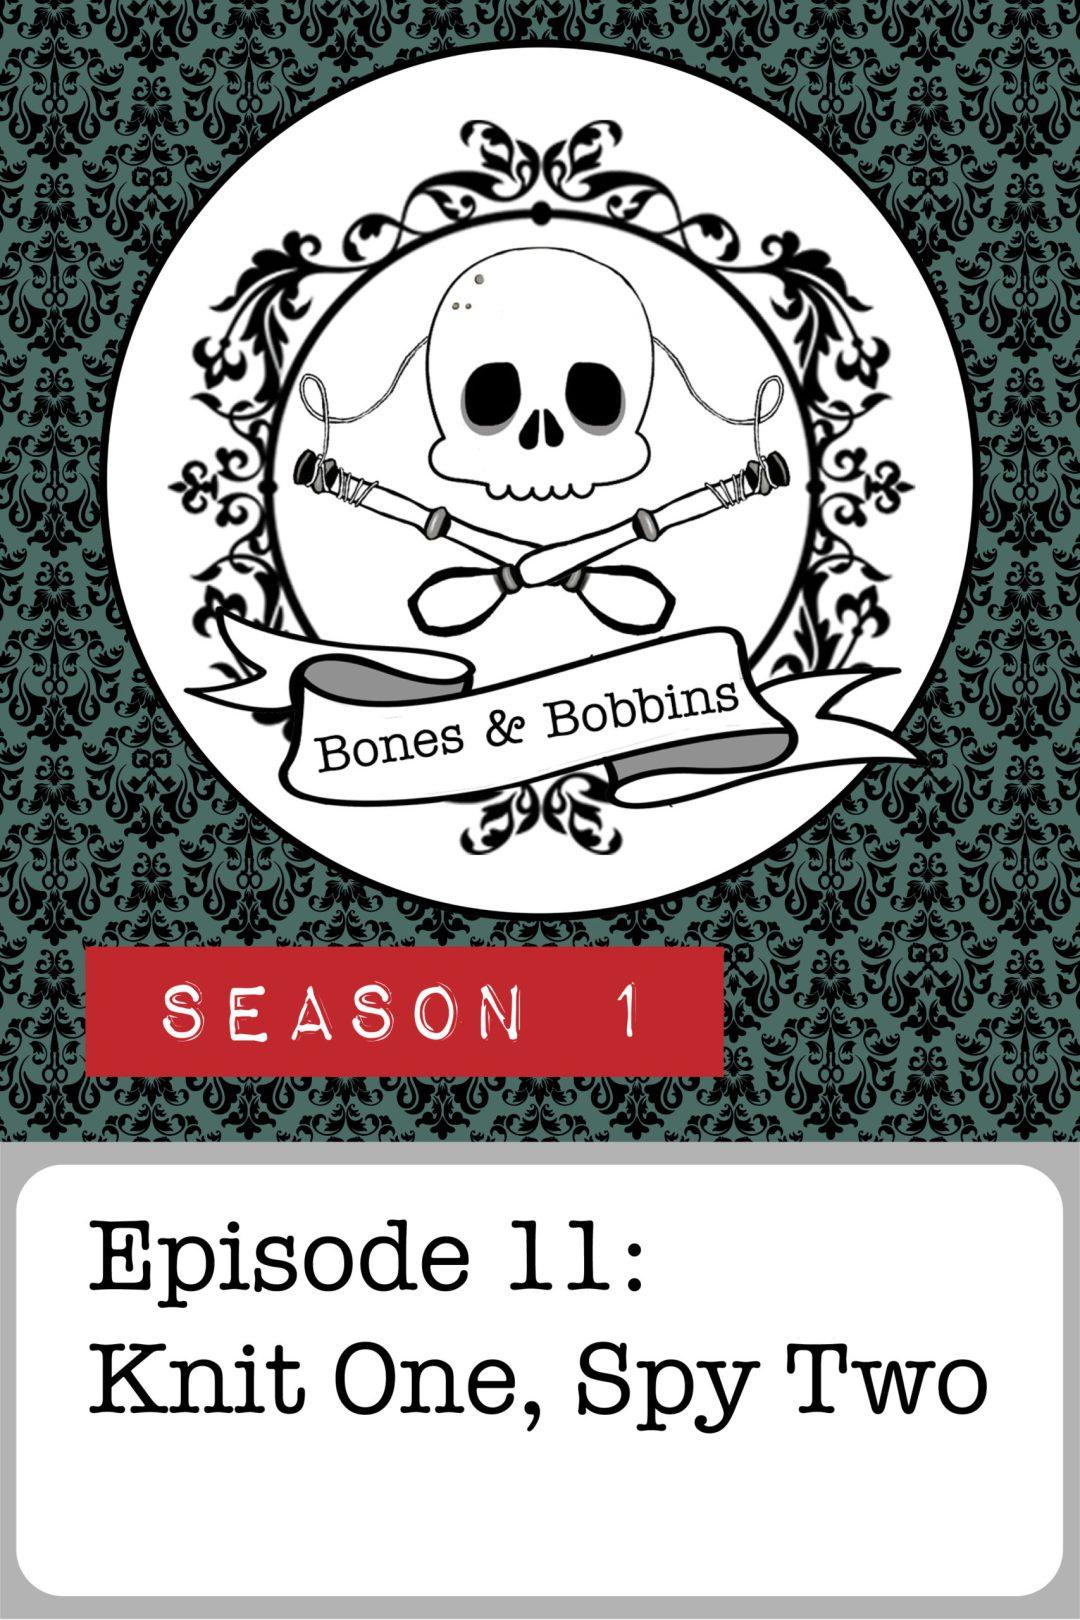 The Bones & Bobbins Podcast, Season 1, Episode 11: Knit One, Spy Two